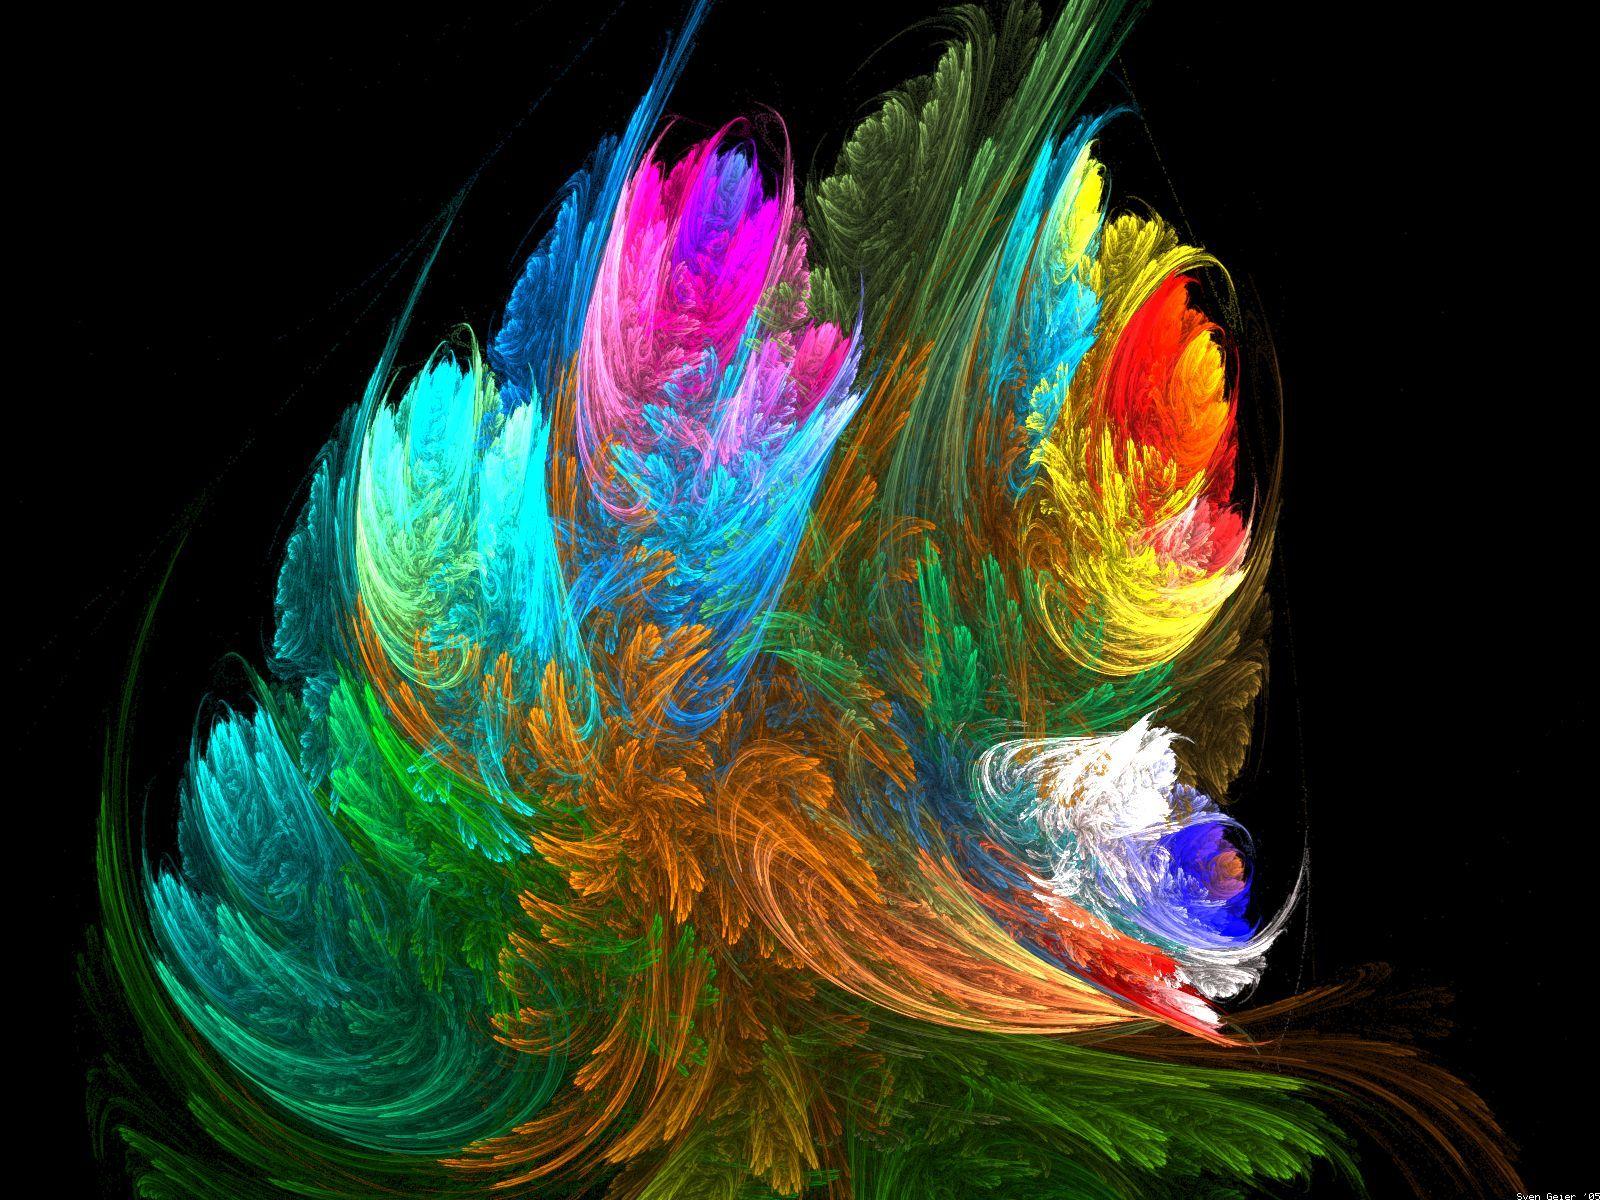 Download Amazing 3D Desktop Backgrounds Wallpapers Mobile ...